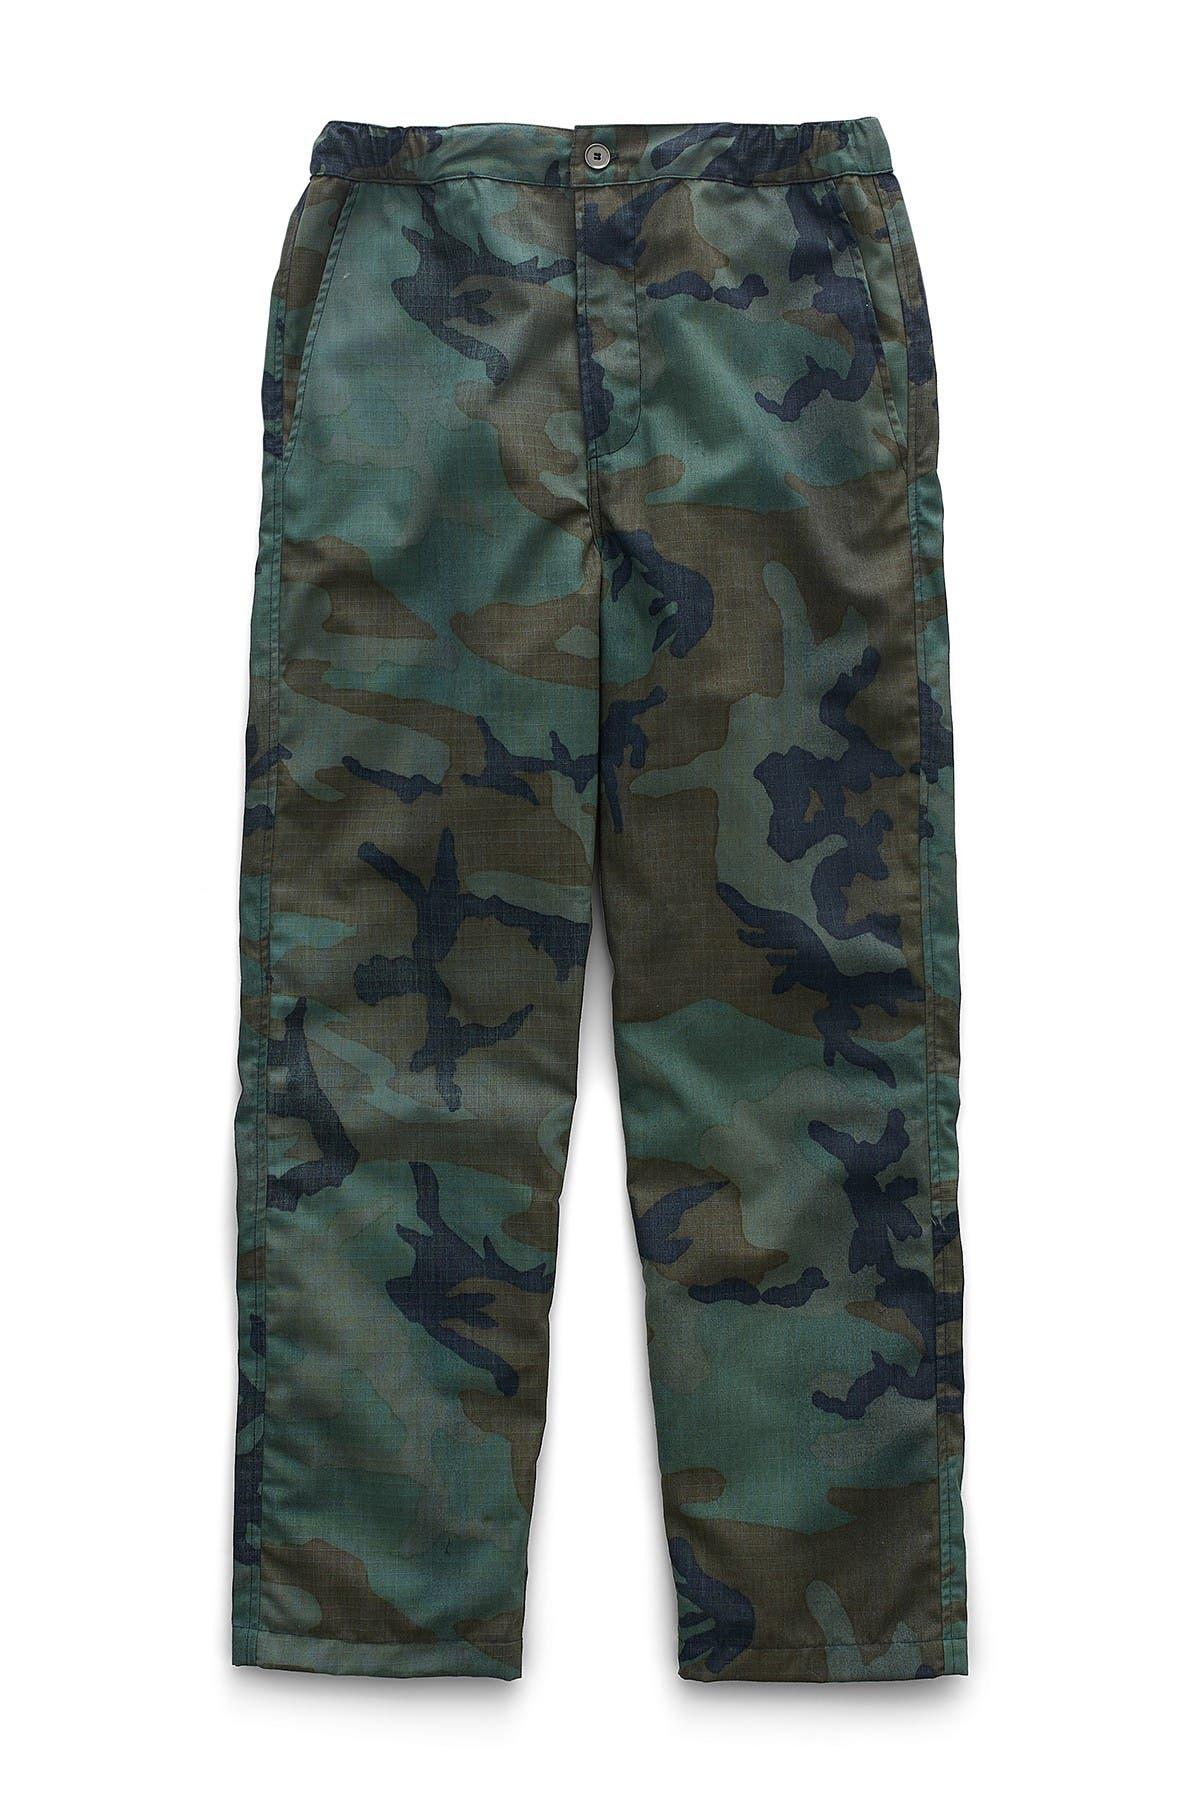 Image of BALDWIN Rogue Camo Print Pants